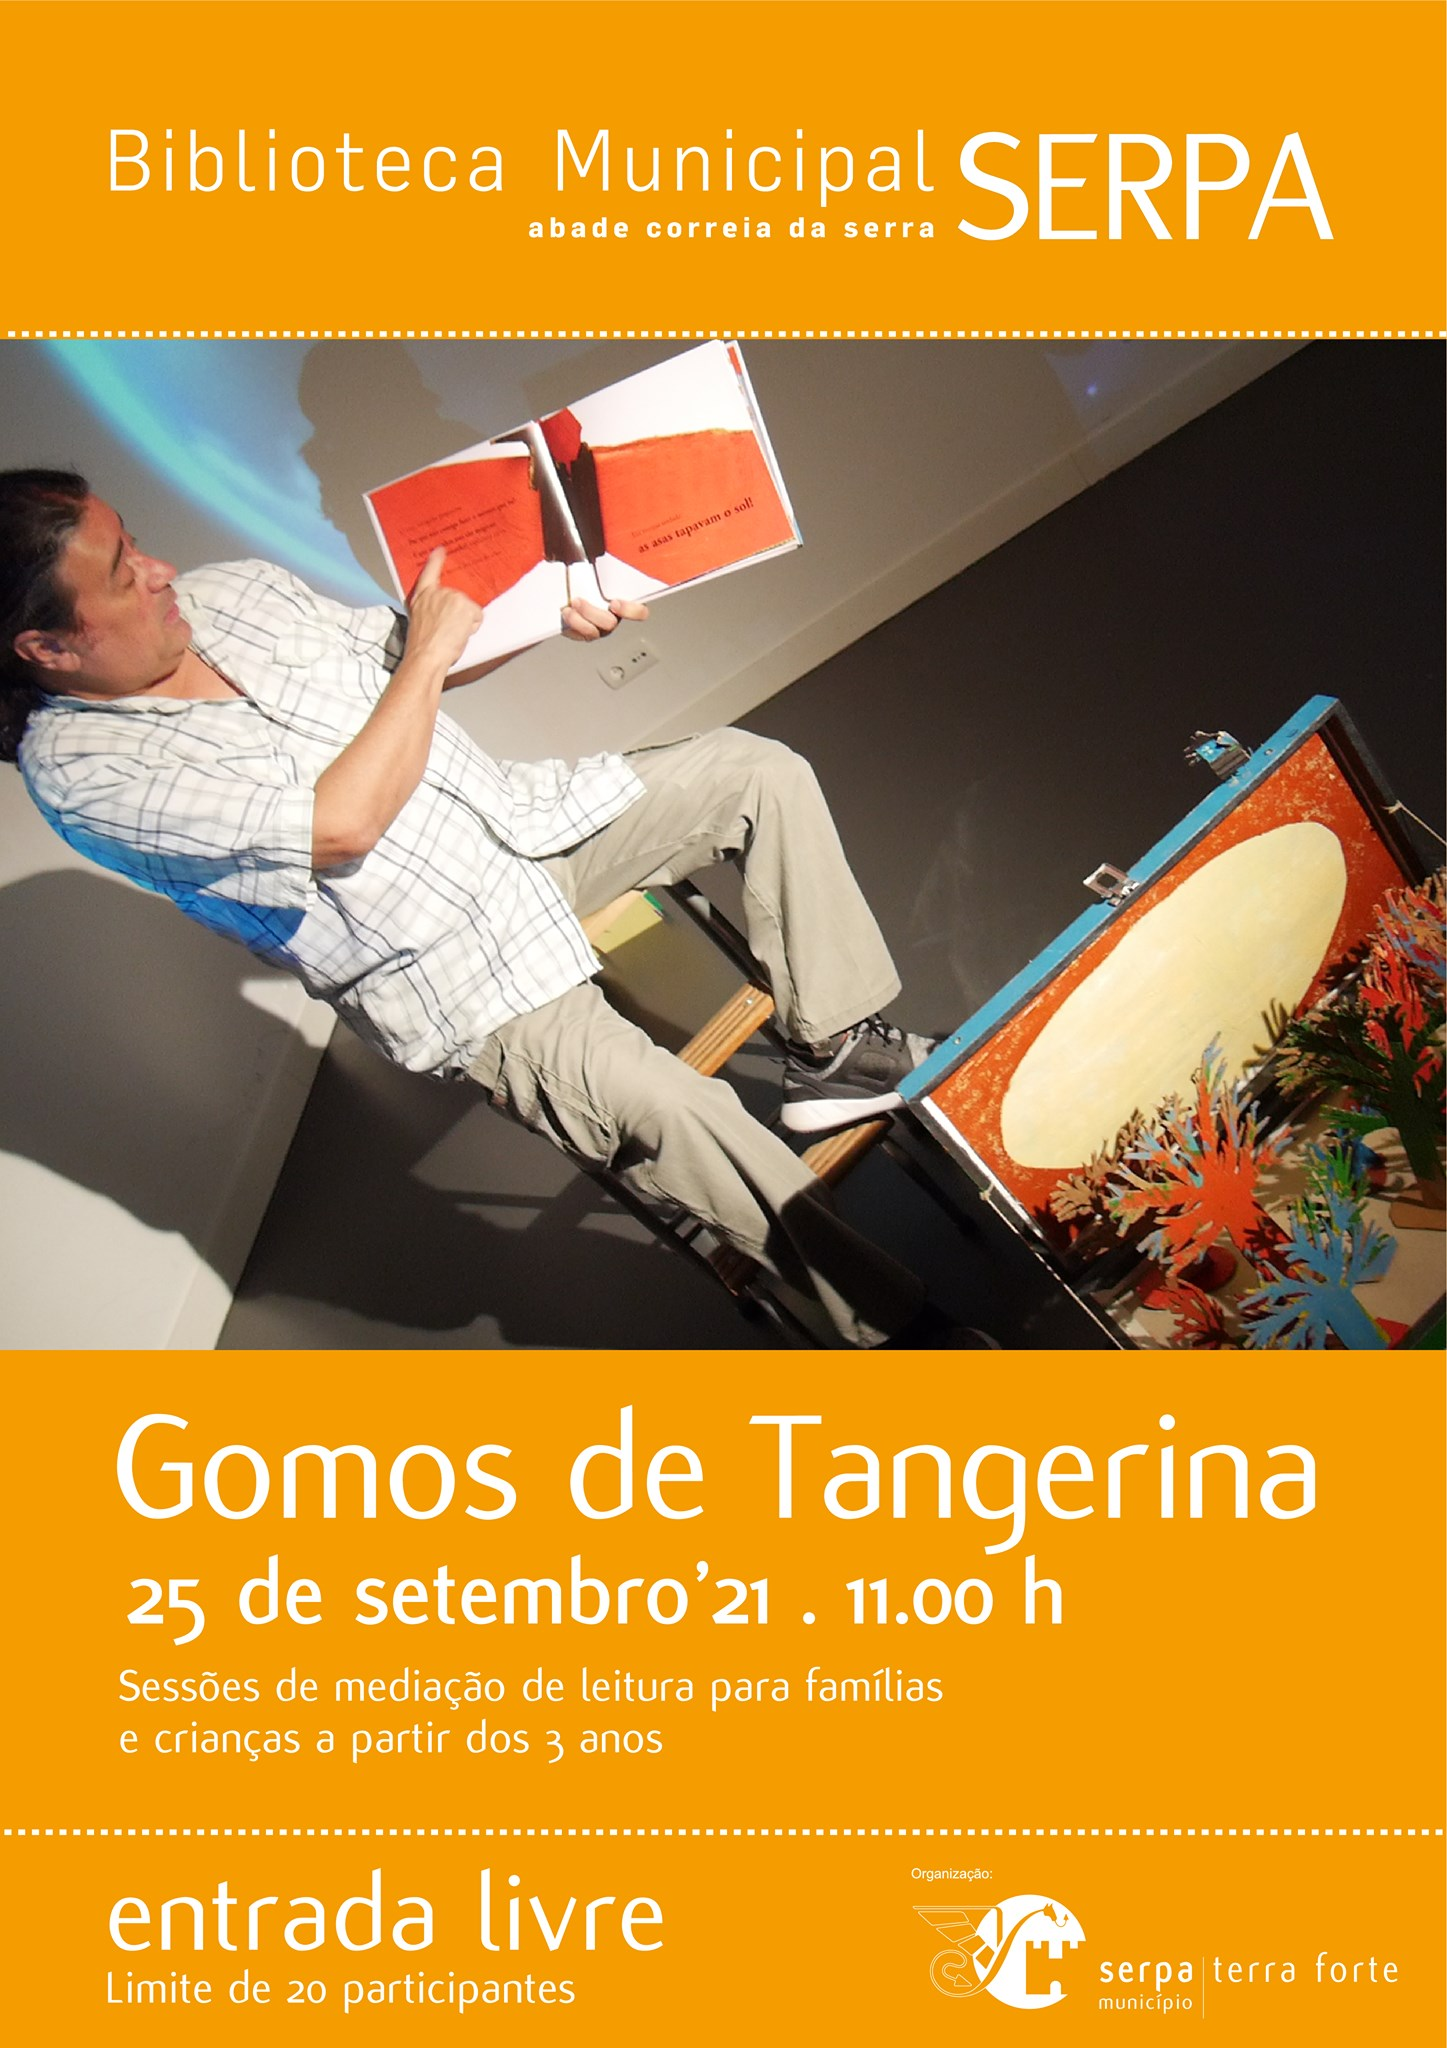 Gomos de Tangerina